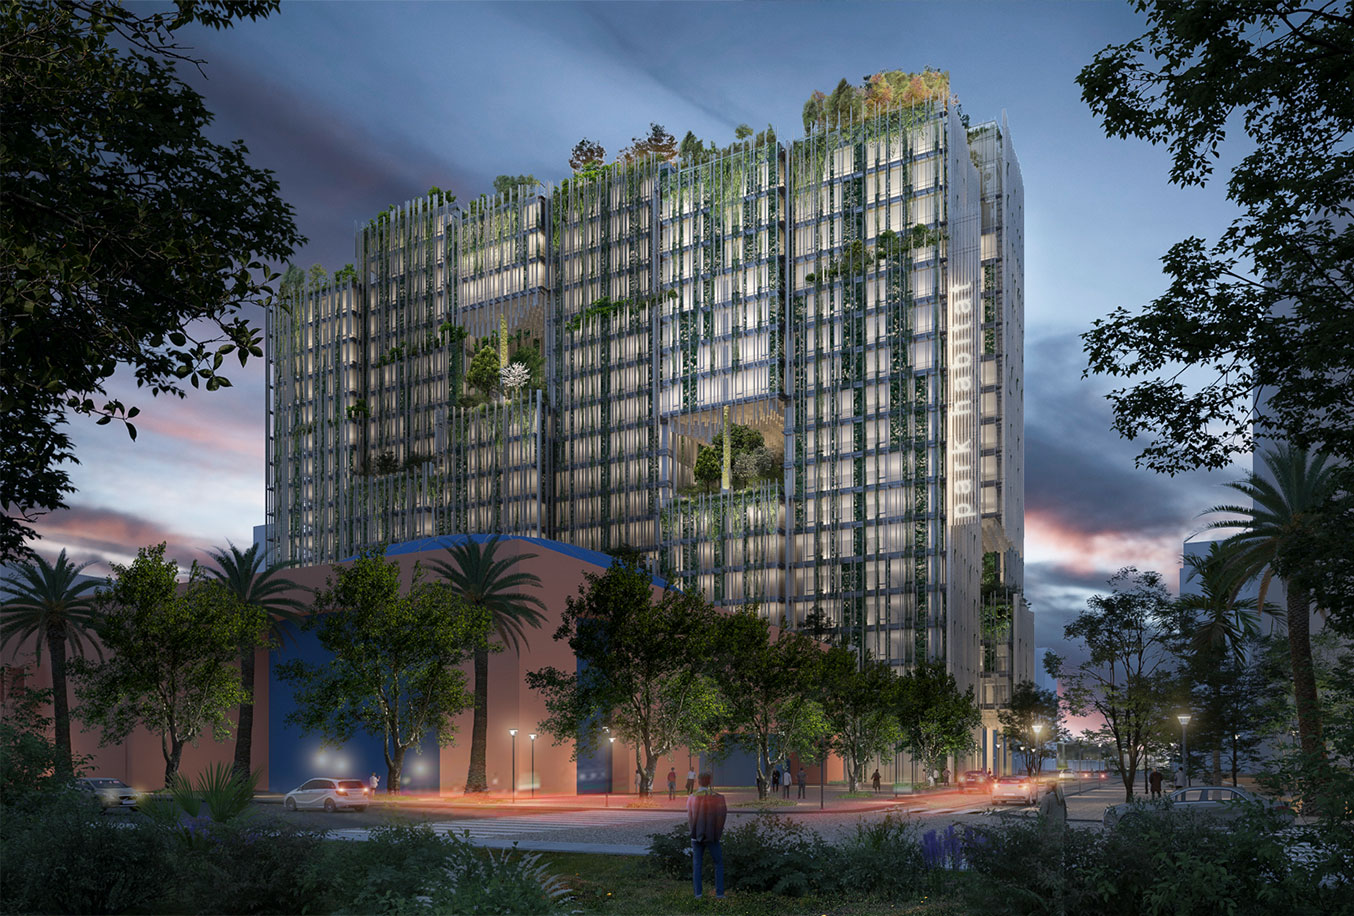 Park Habitat Westbank Development San Jose Sustainable High-Rise Rendering by Kengo Kuma and Associates